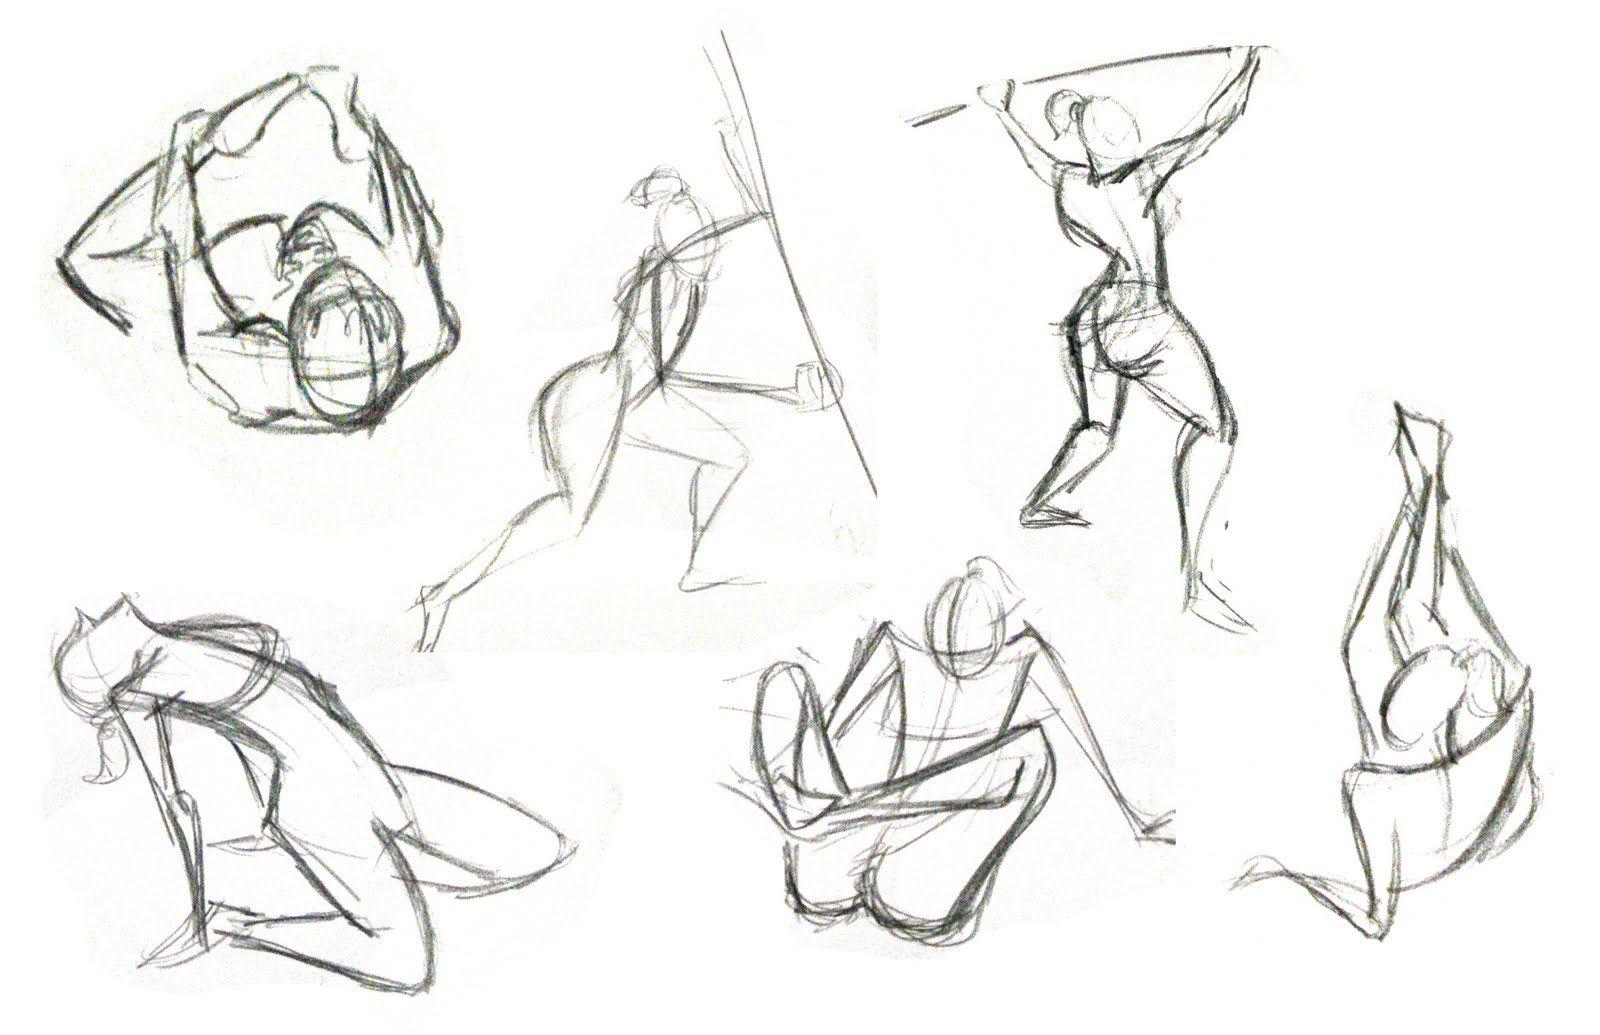 pose generator drawing - Pesquisa Google | amm | Pinterest